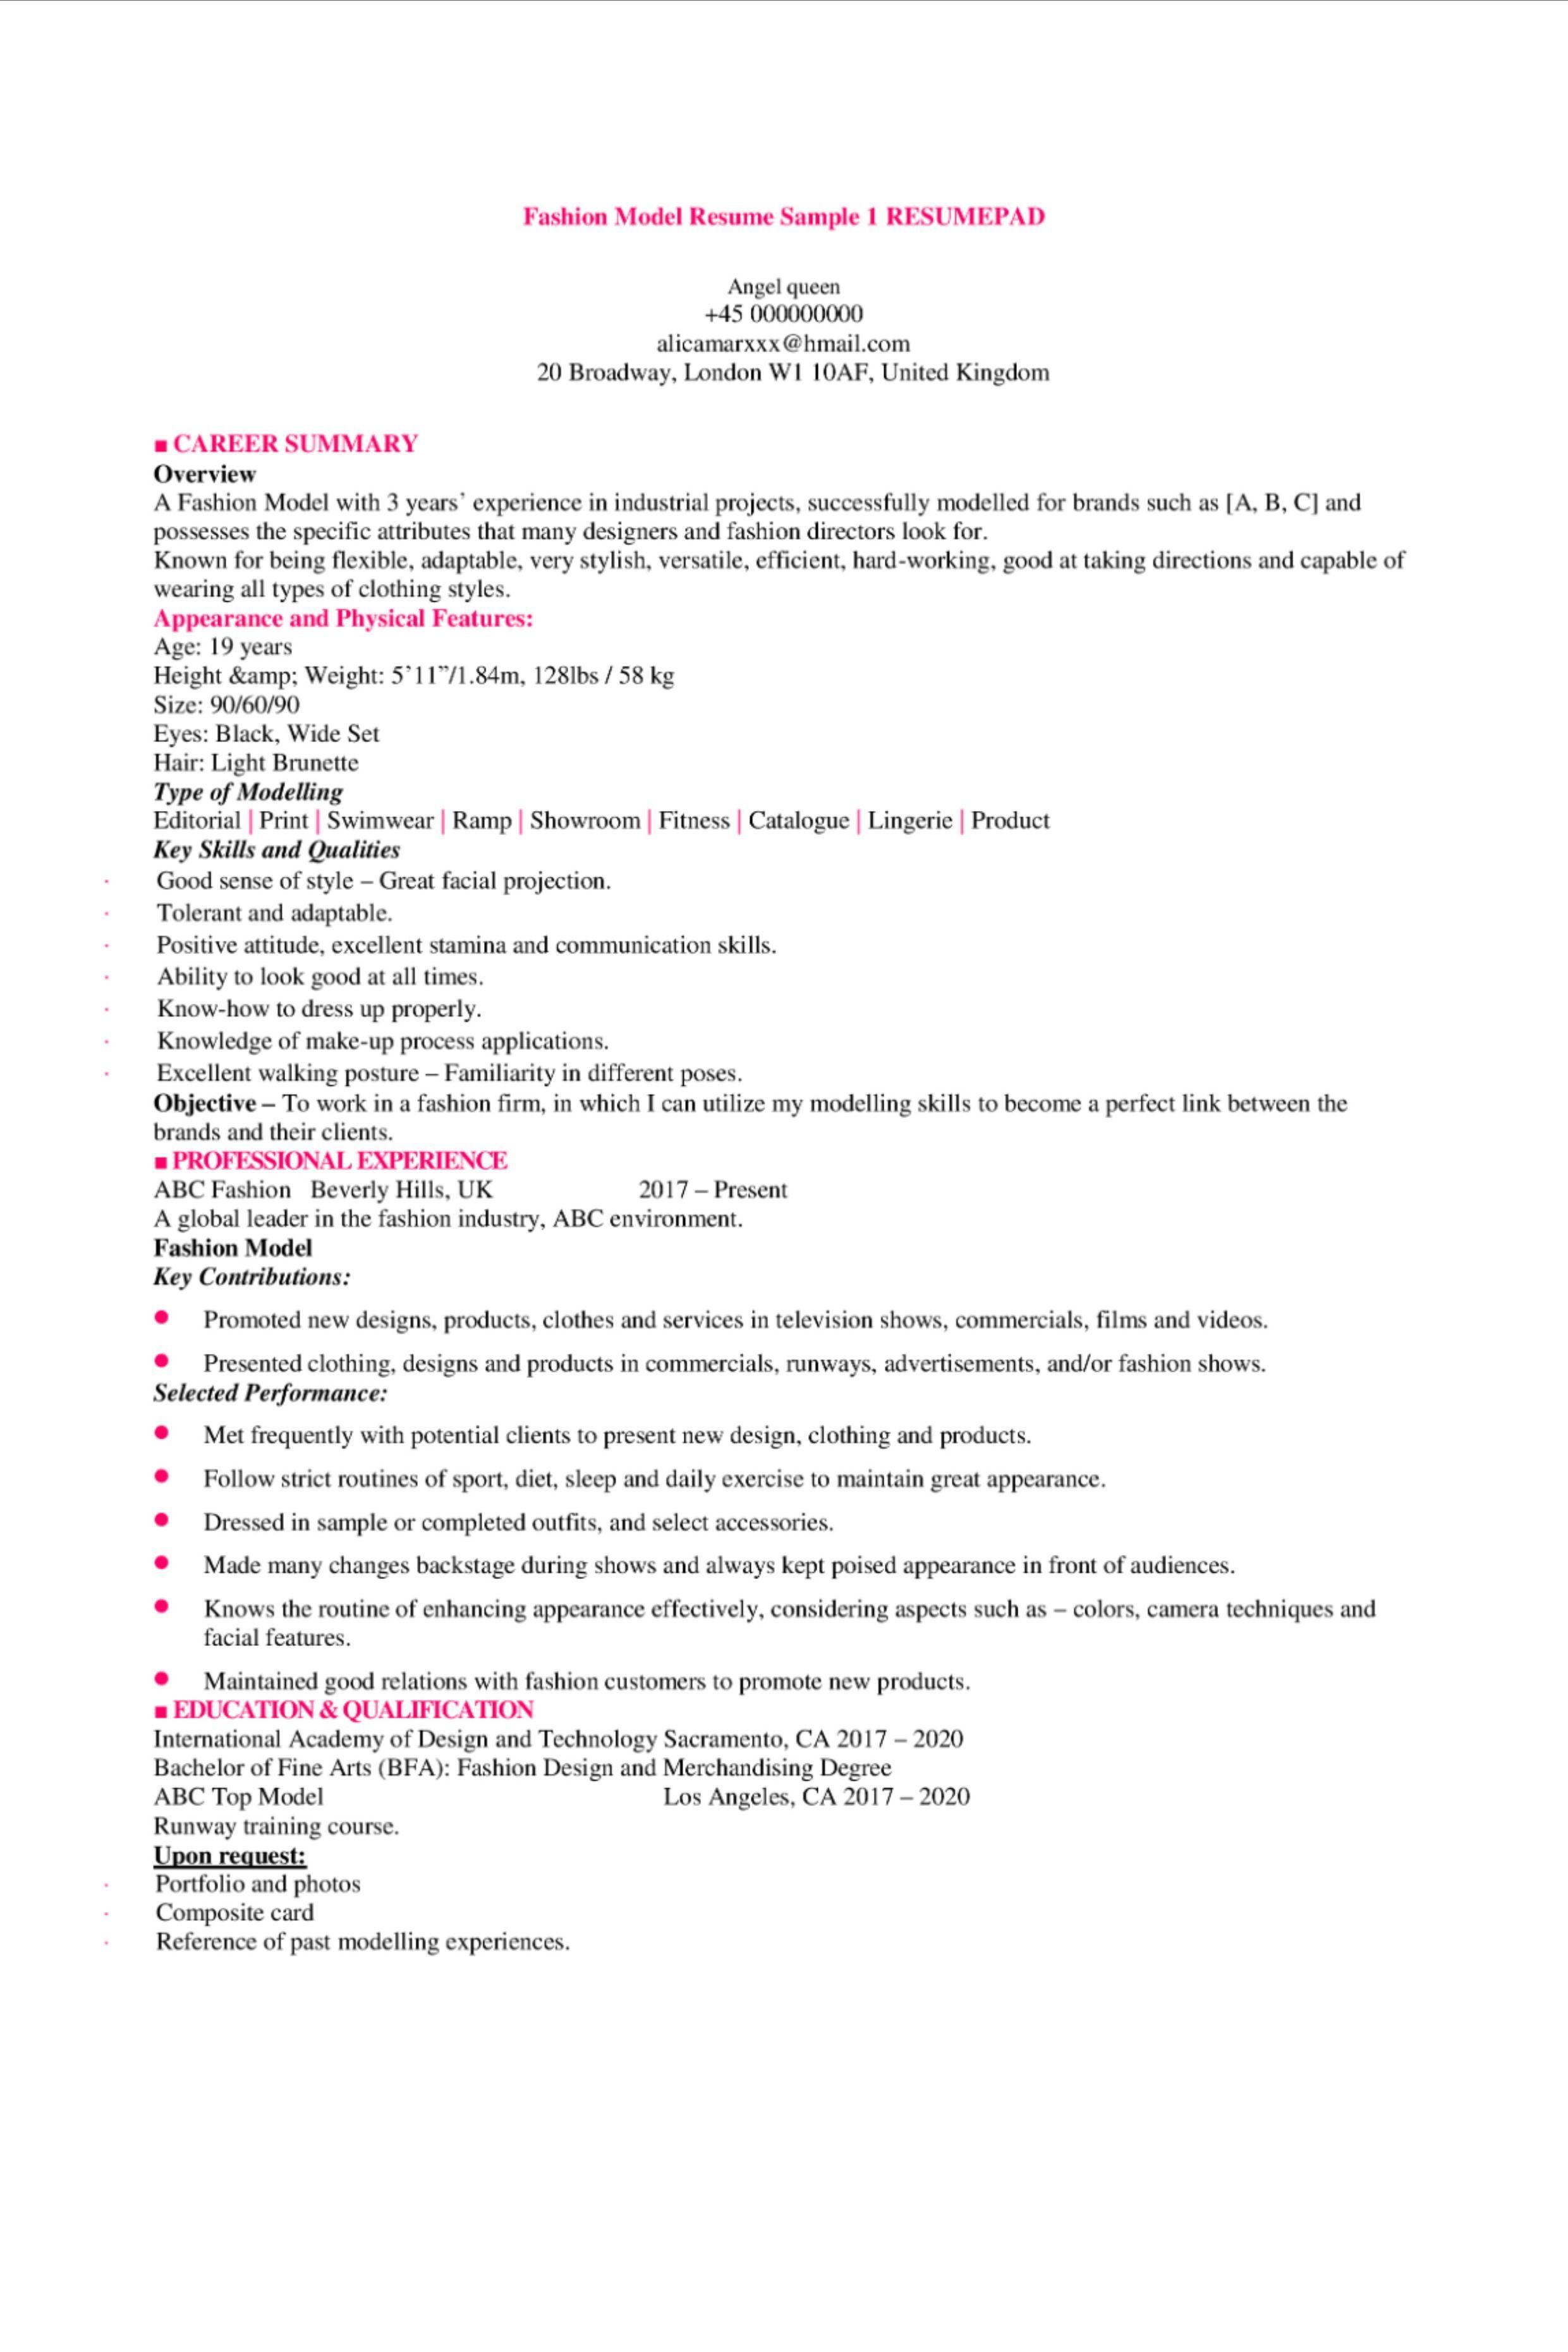 Model Resume Sample 1 Resumepad Model Resumes Fashion Model Resume Sample 1 Resumepad Download A Fairly Minimalist Resume For Models